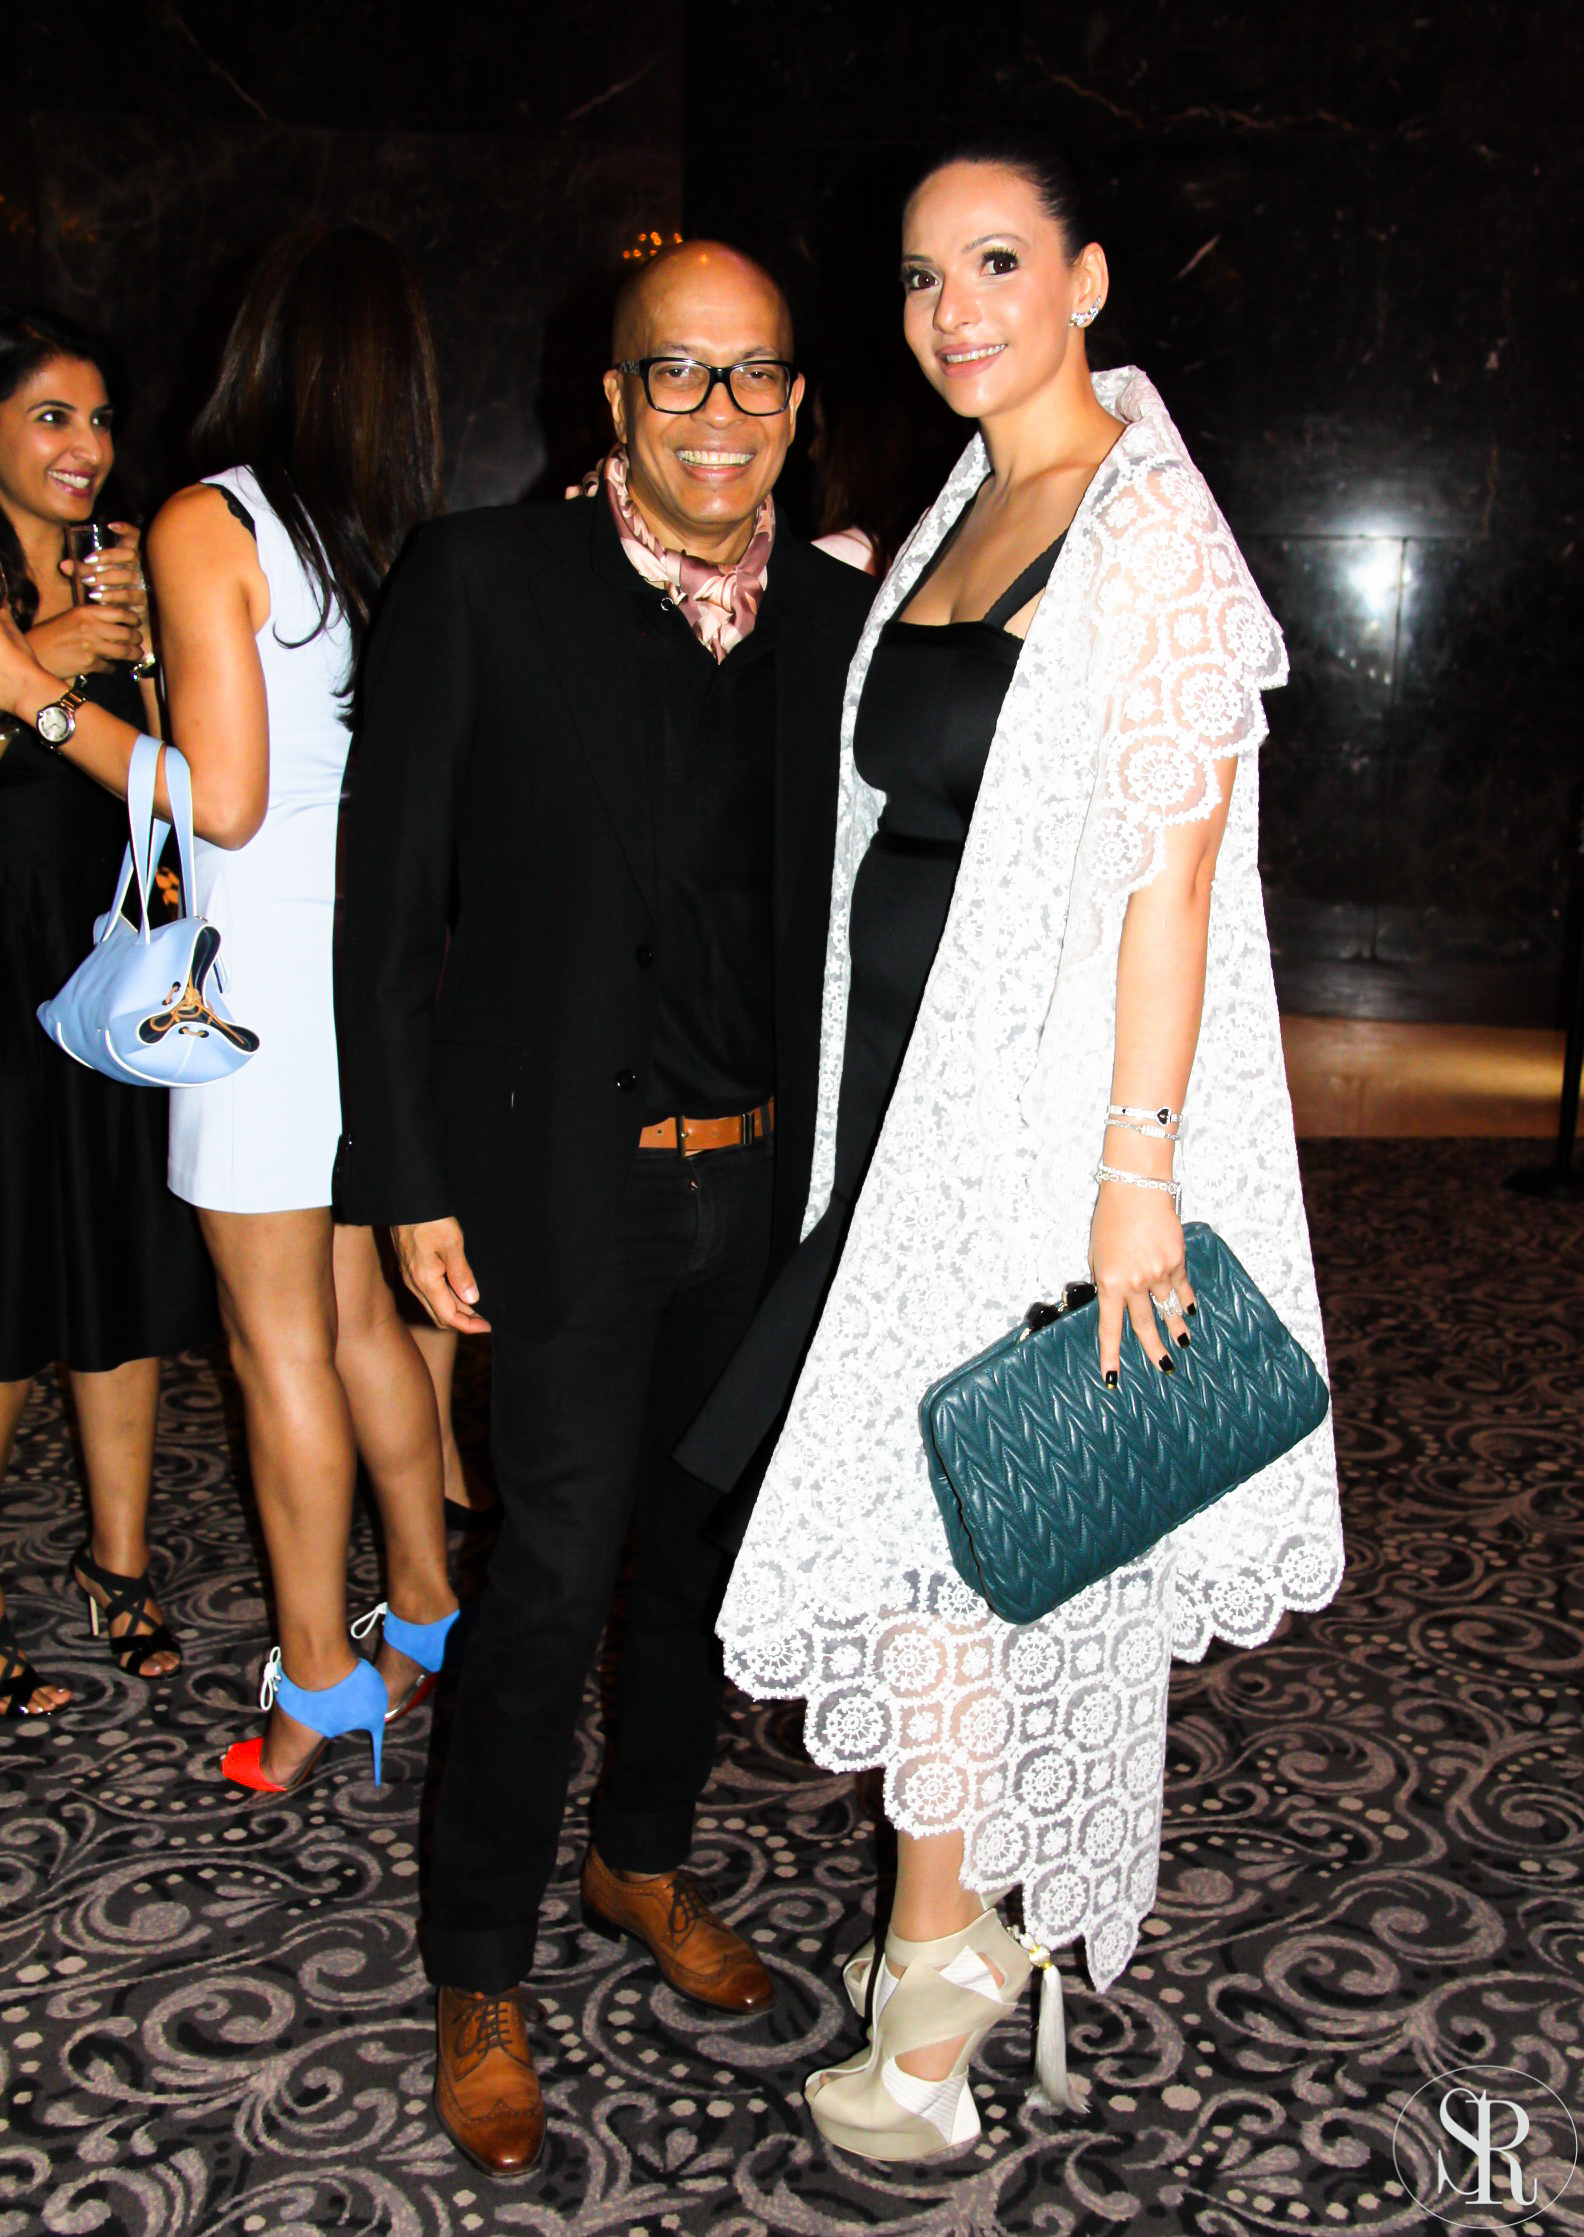 VIP launch of MANOLO BLAHNIK collection Fashion Afternoon Tea by Raffles Dubai-4159.jpg